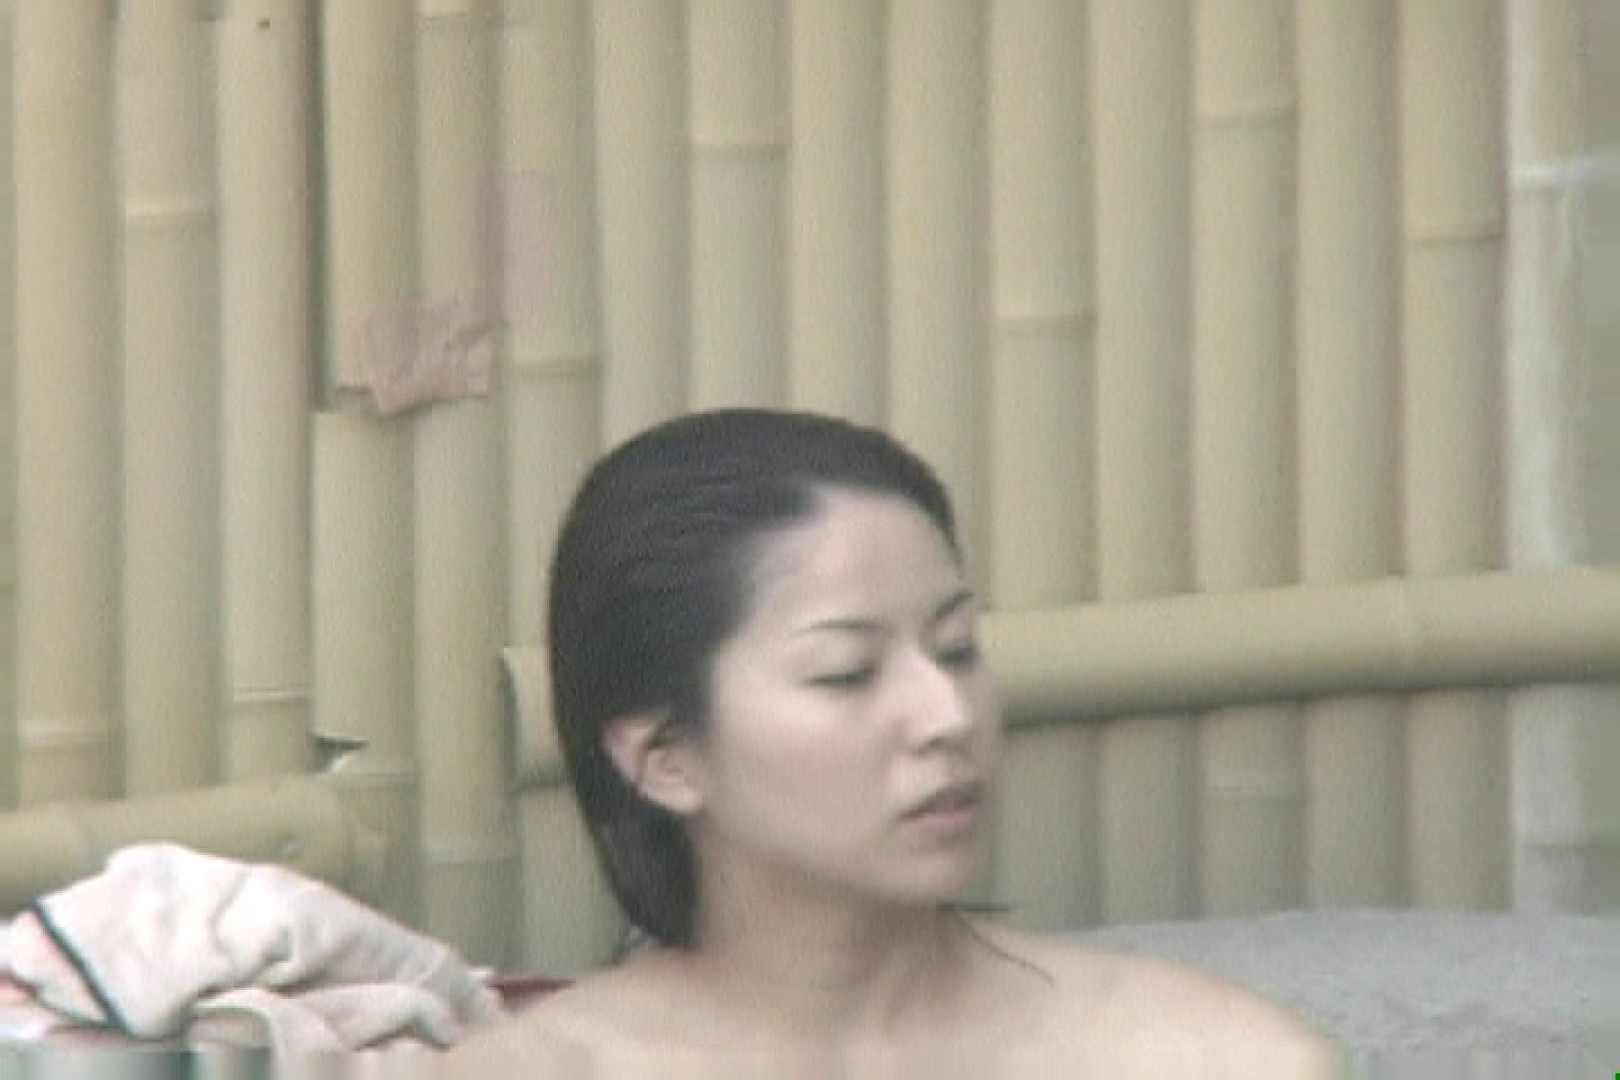 Aquaな露天風呂Vol.694 盗撮 | OLエロ画像  110PICs 94